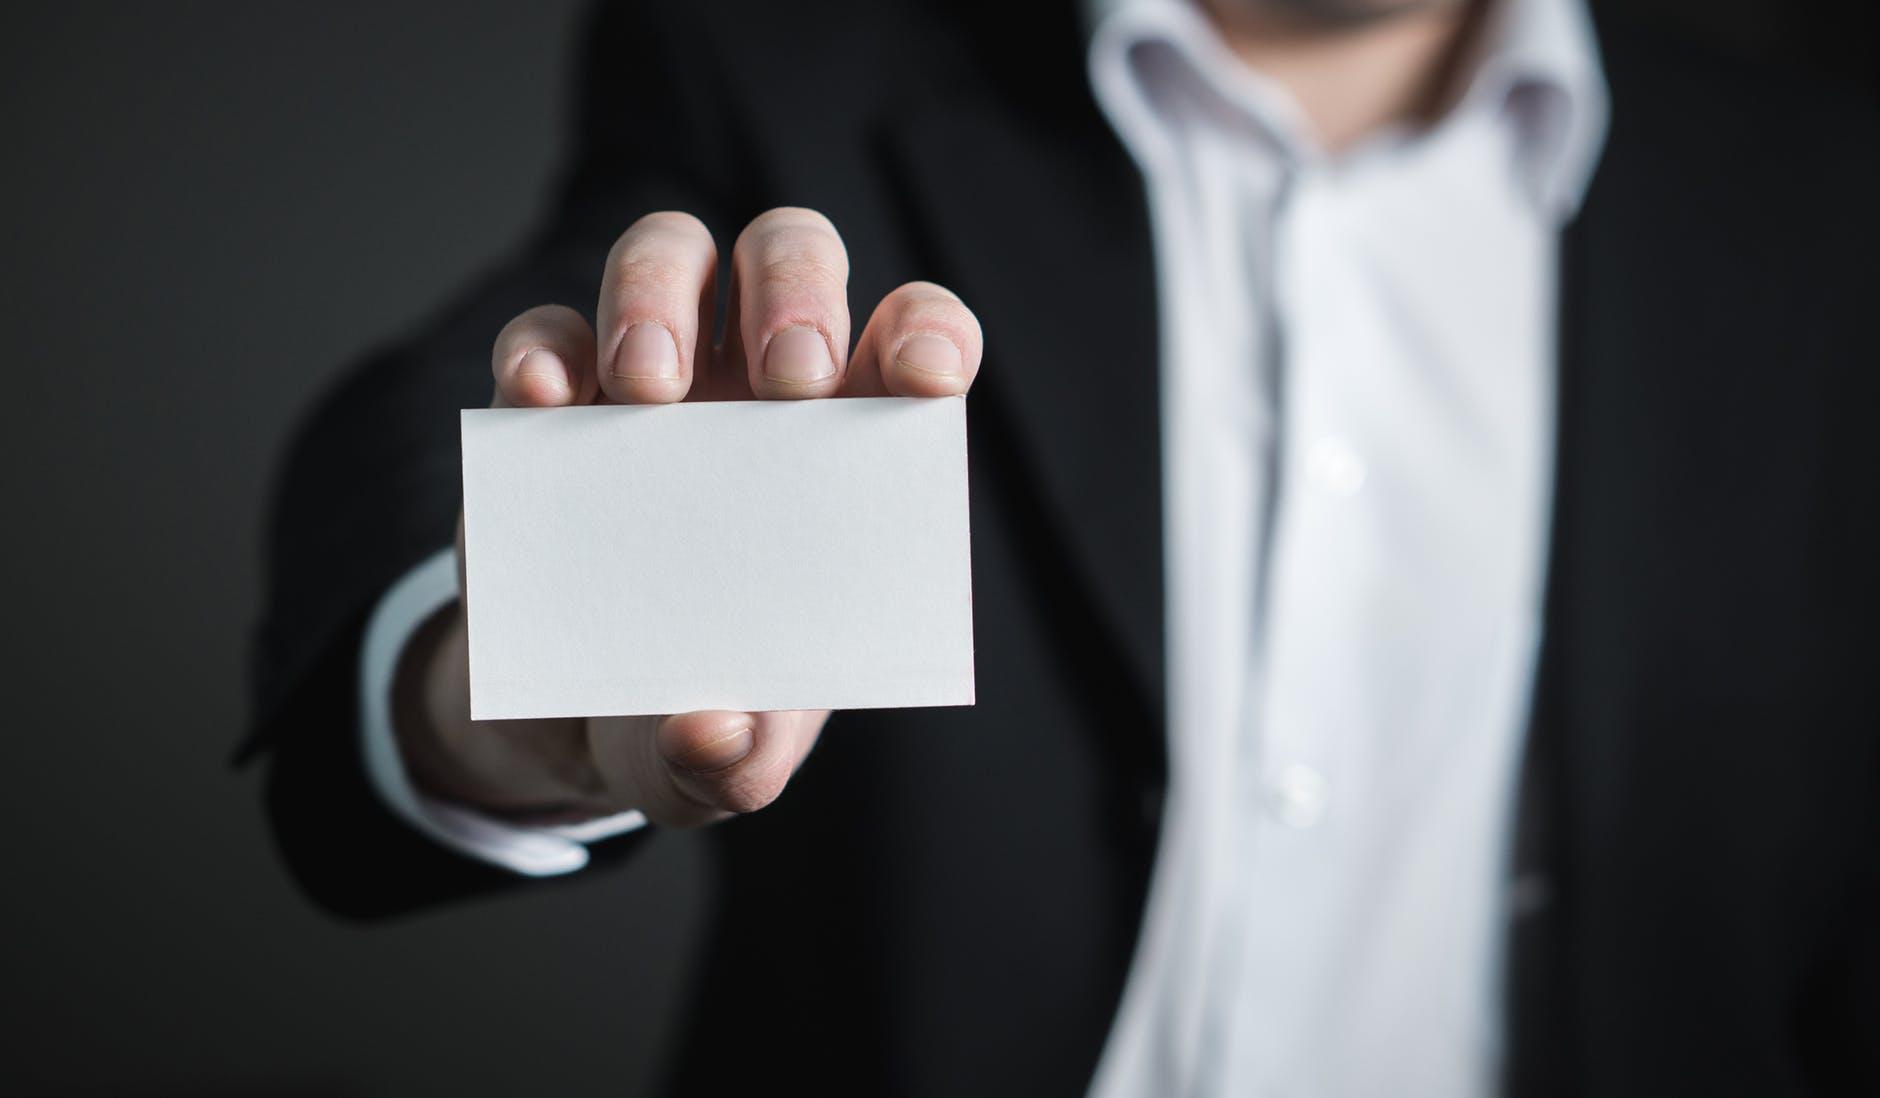 Pelatihan Etiquette and Personal Image for Professionals